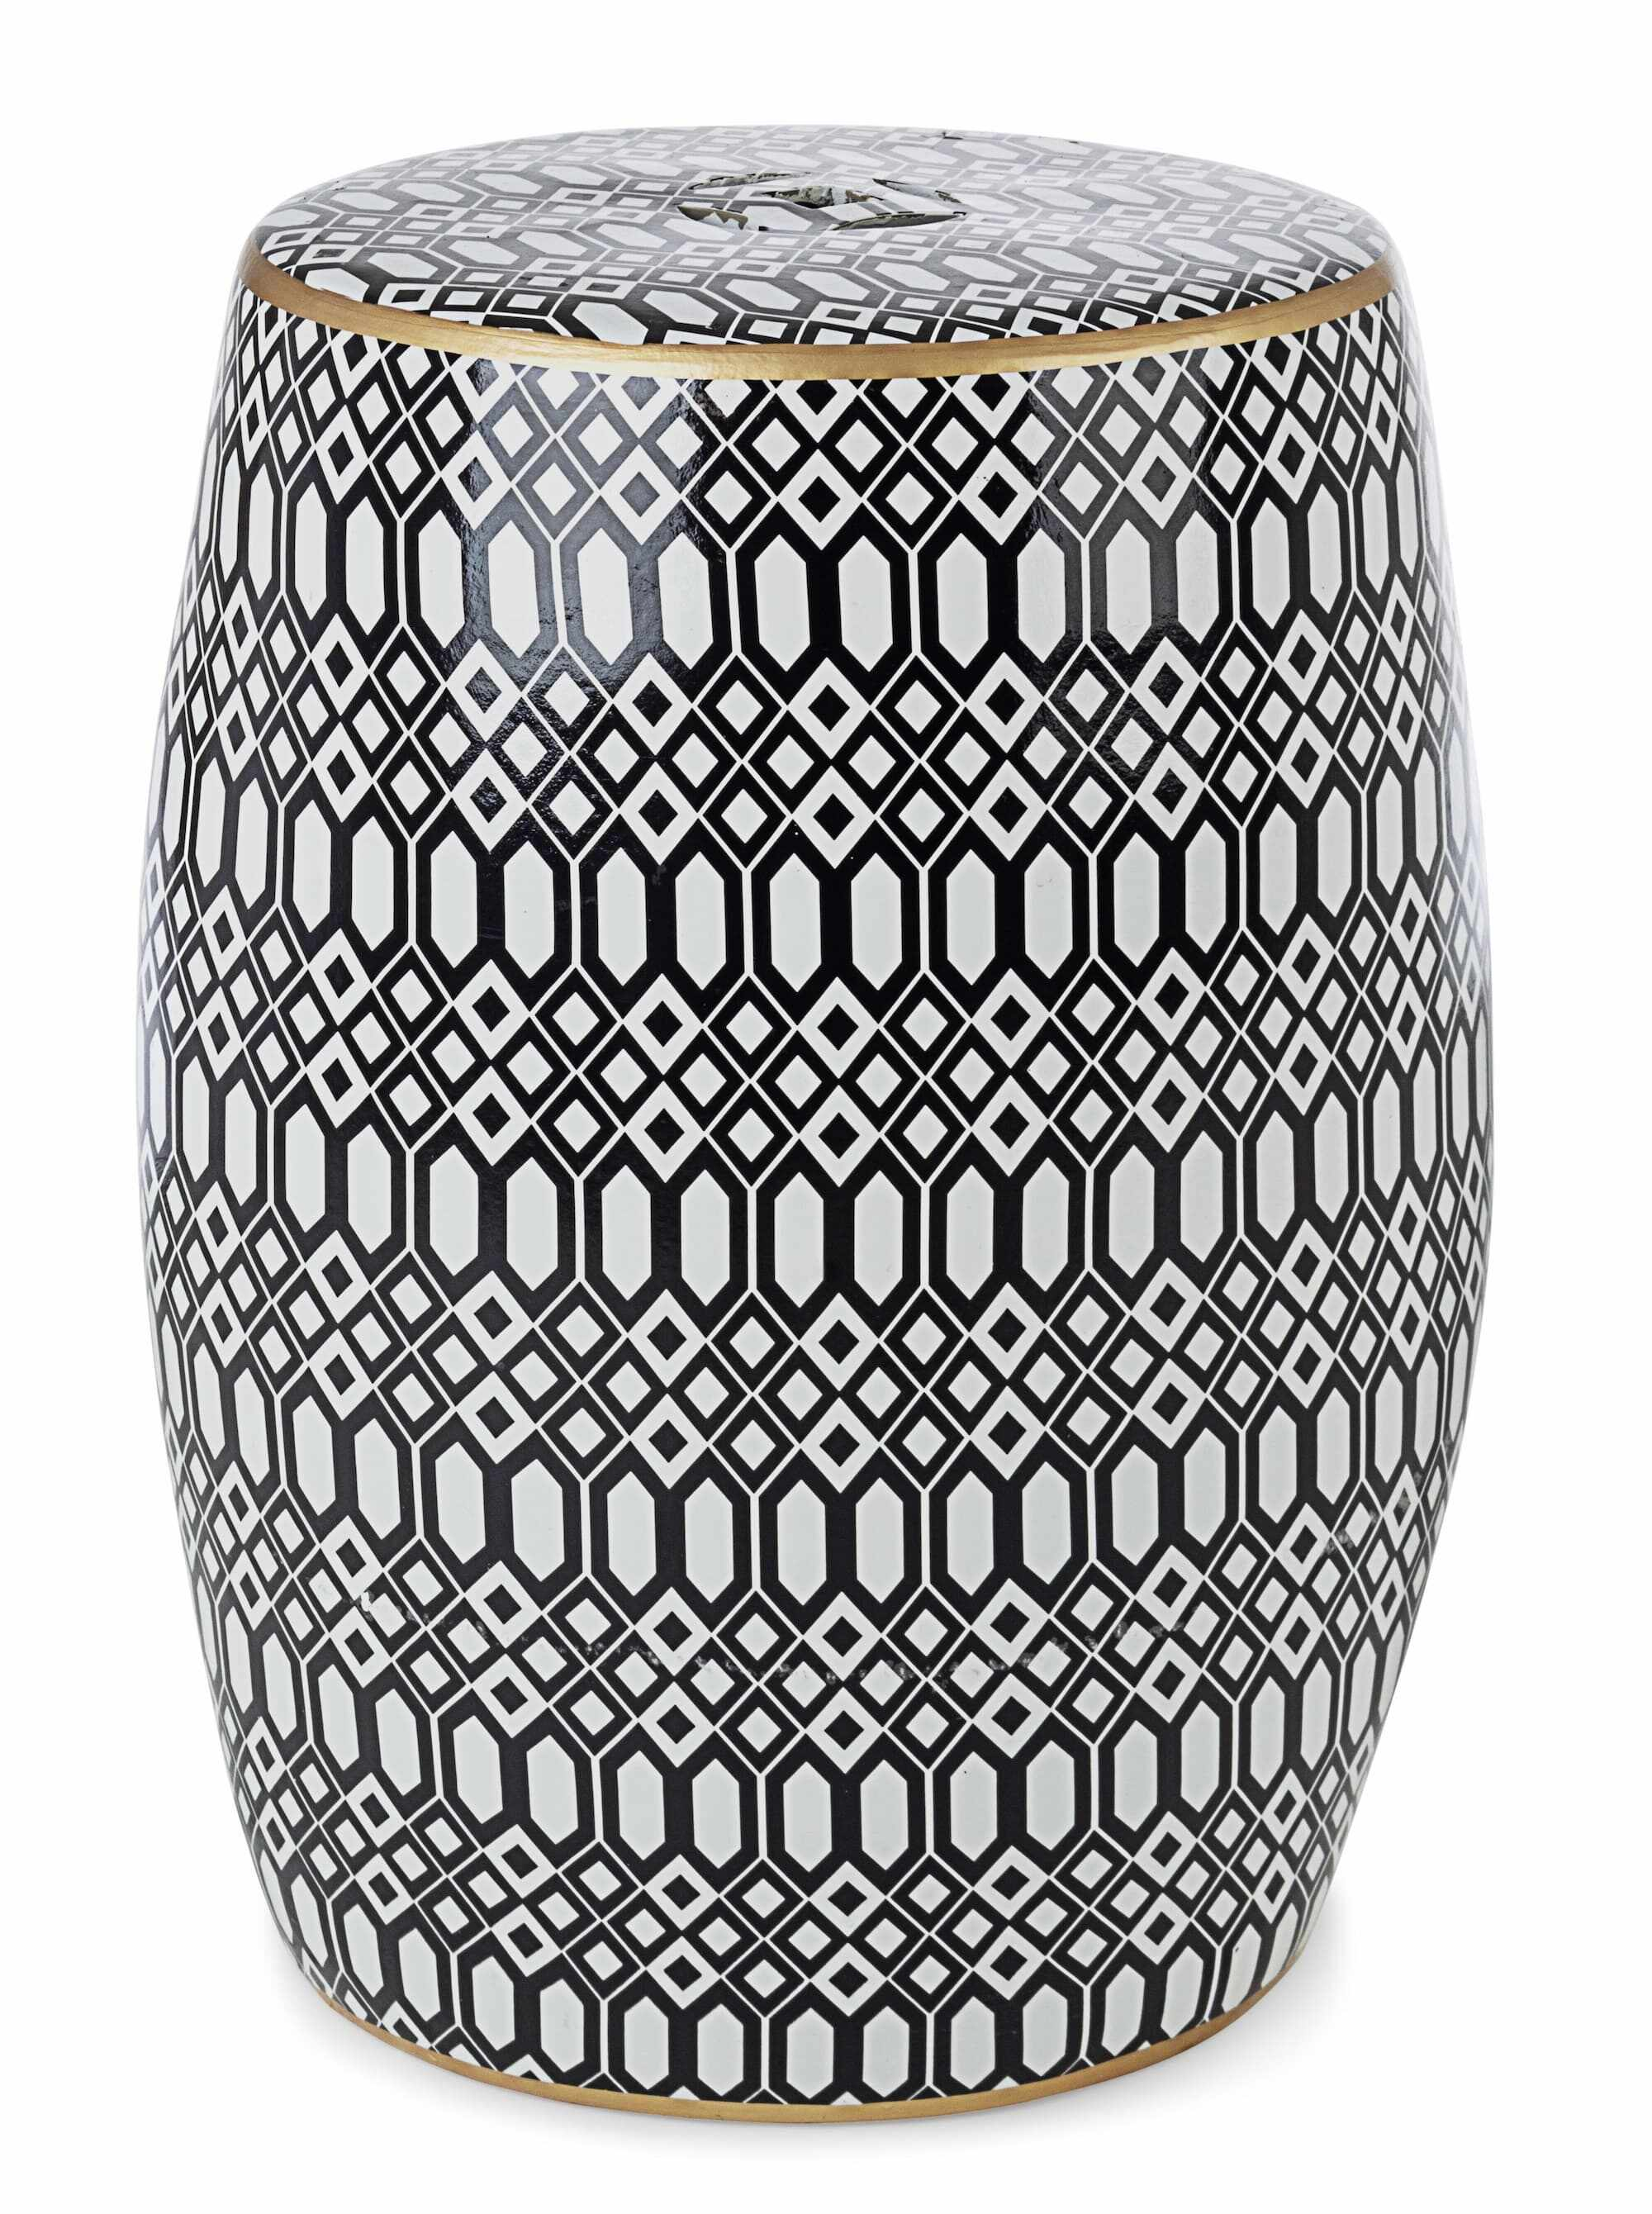 Taburet din ceramica Sfinge Arabic Alb / Negru, Ø33xH46 cm la pret 473 lei